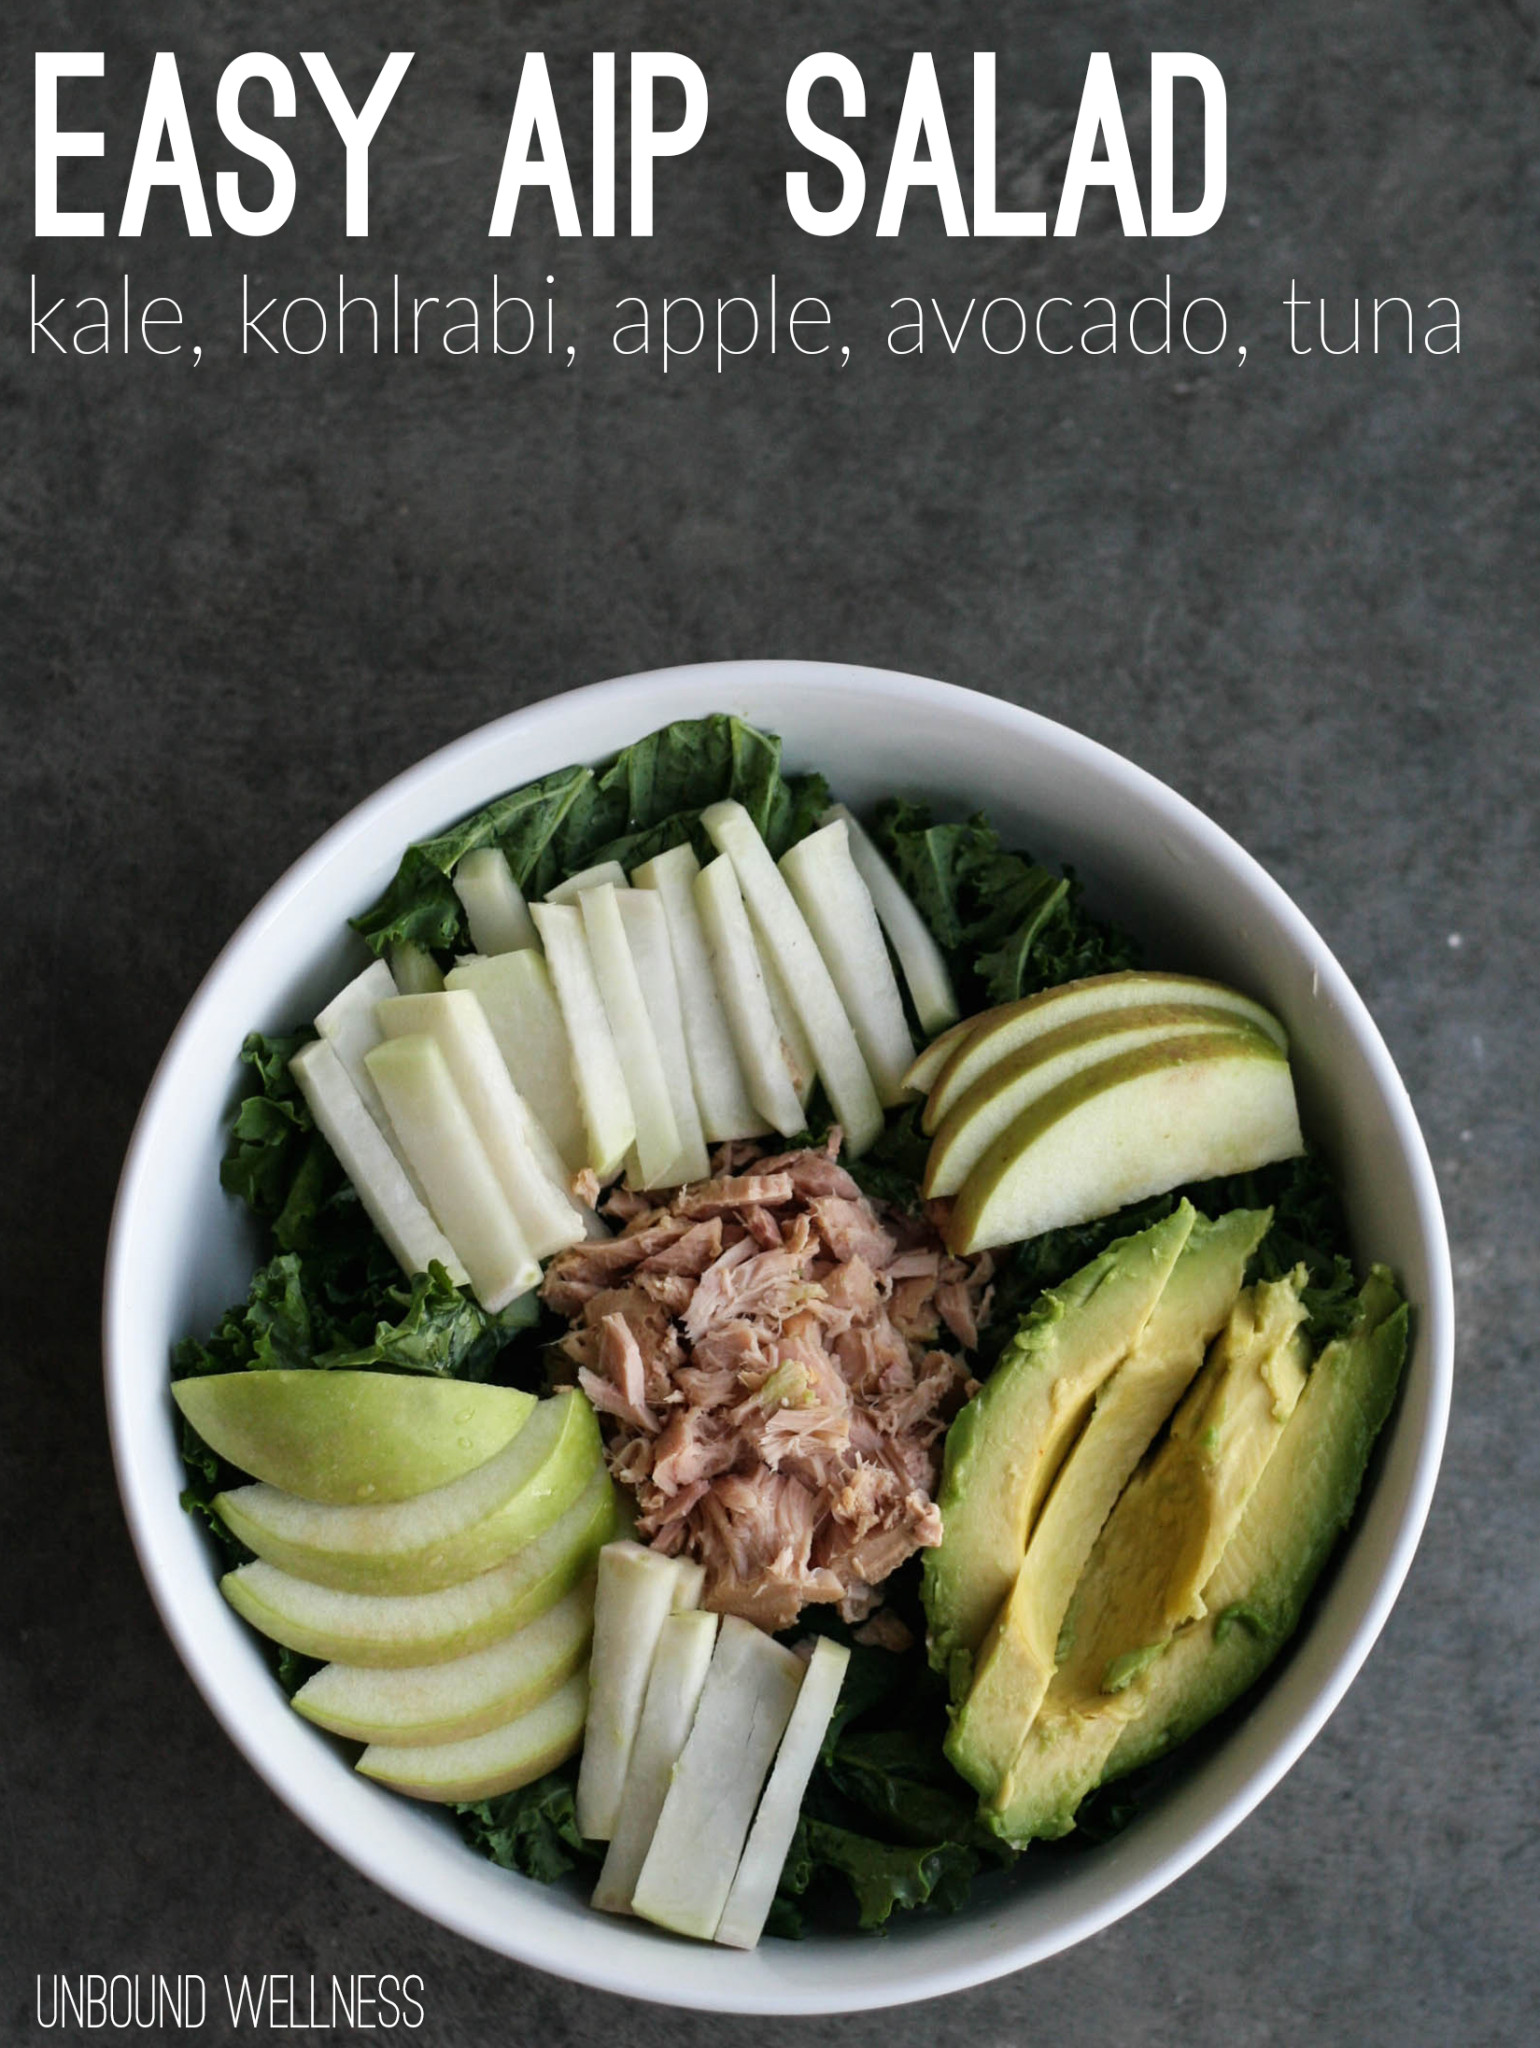 Easy Autoimmune Paleo Salad | Kale, Kohlrabi, Avocado, Apple and Tuna